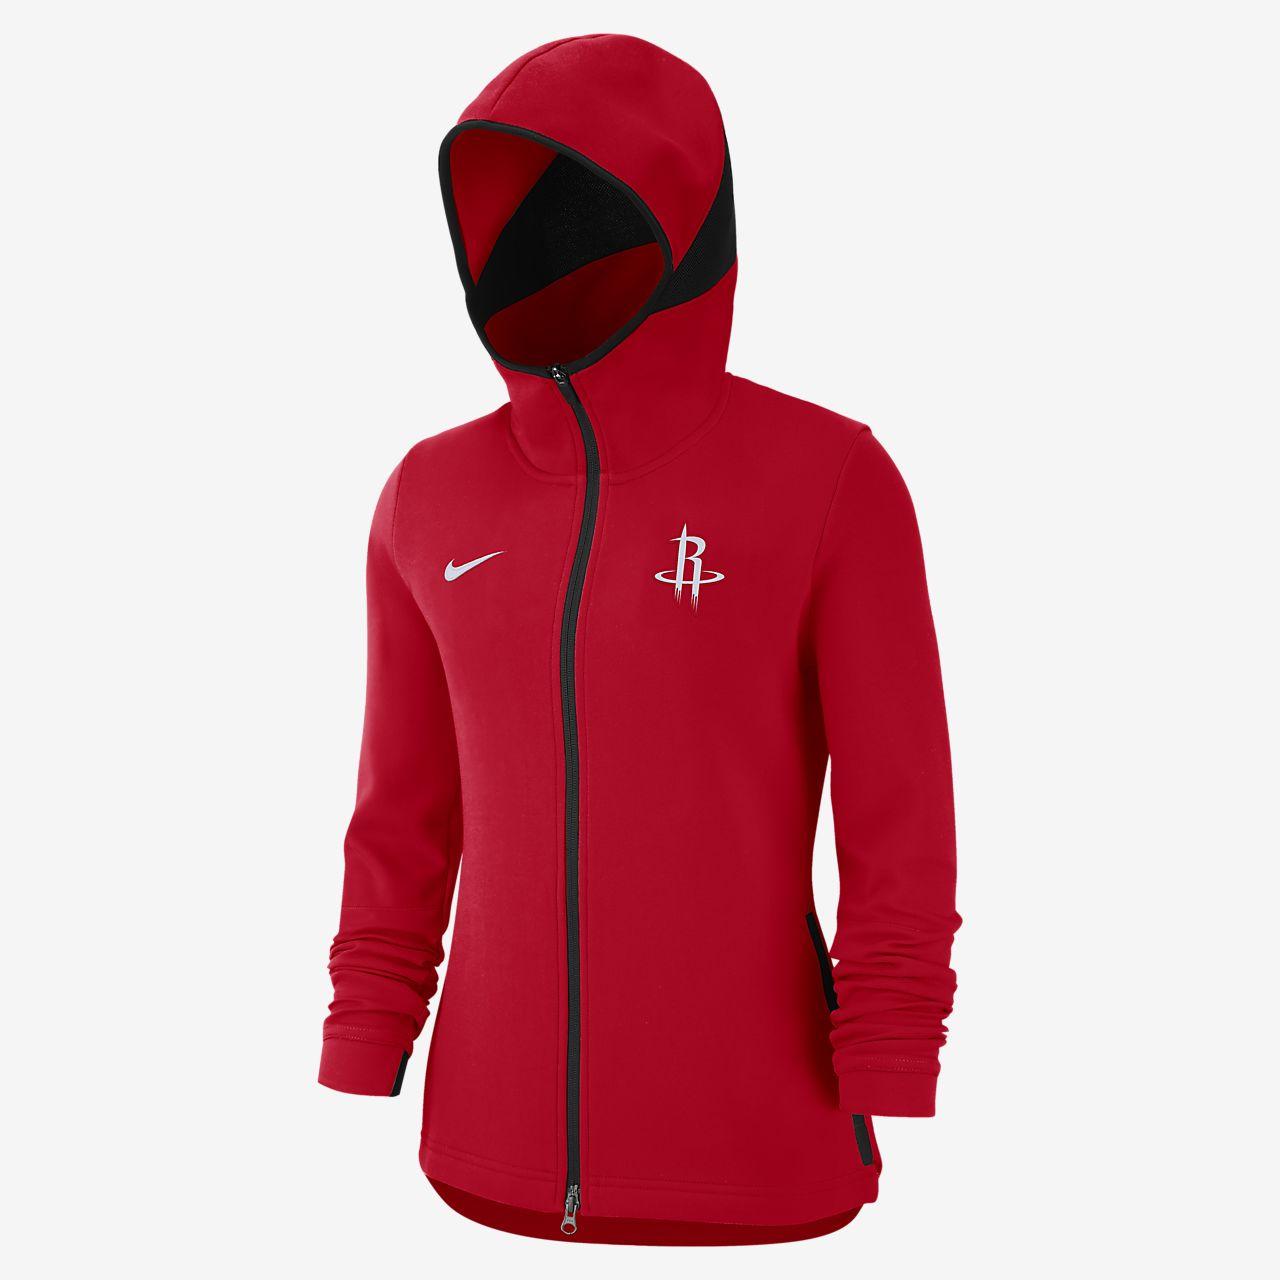 f18a740ea3d Houston Rockets Nike Dri-FIT Showtime Women's NBA Hoodie. Nike.com